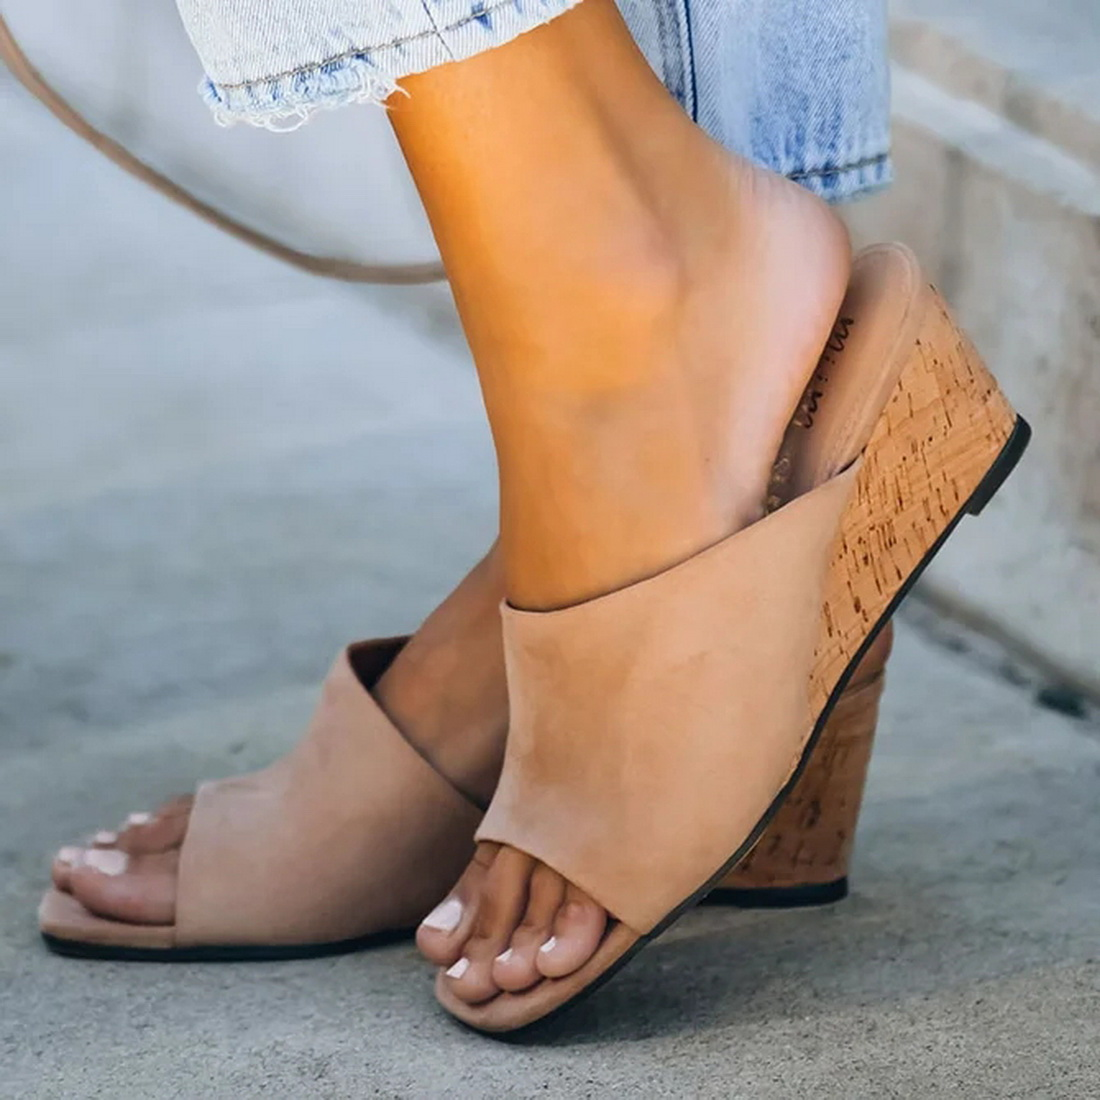 Women Slippers 2020 Summer Casual Beach Slip on Platform Ladies Sandals Dress Party Peep Toe Female Sandals Plus 43